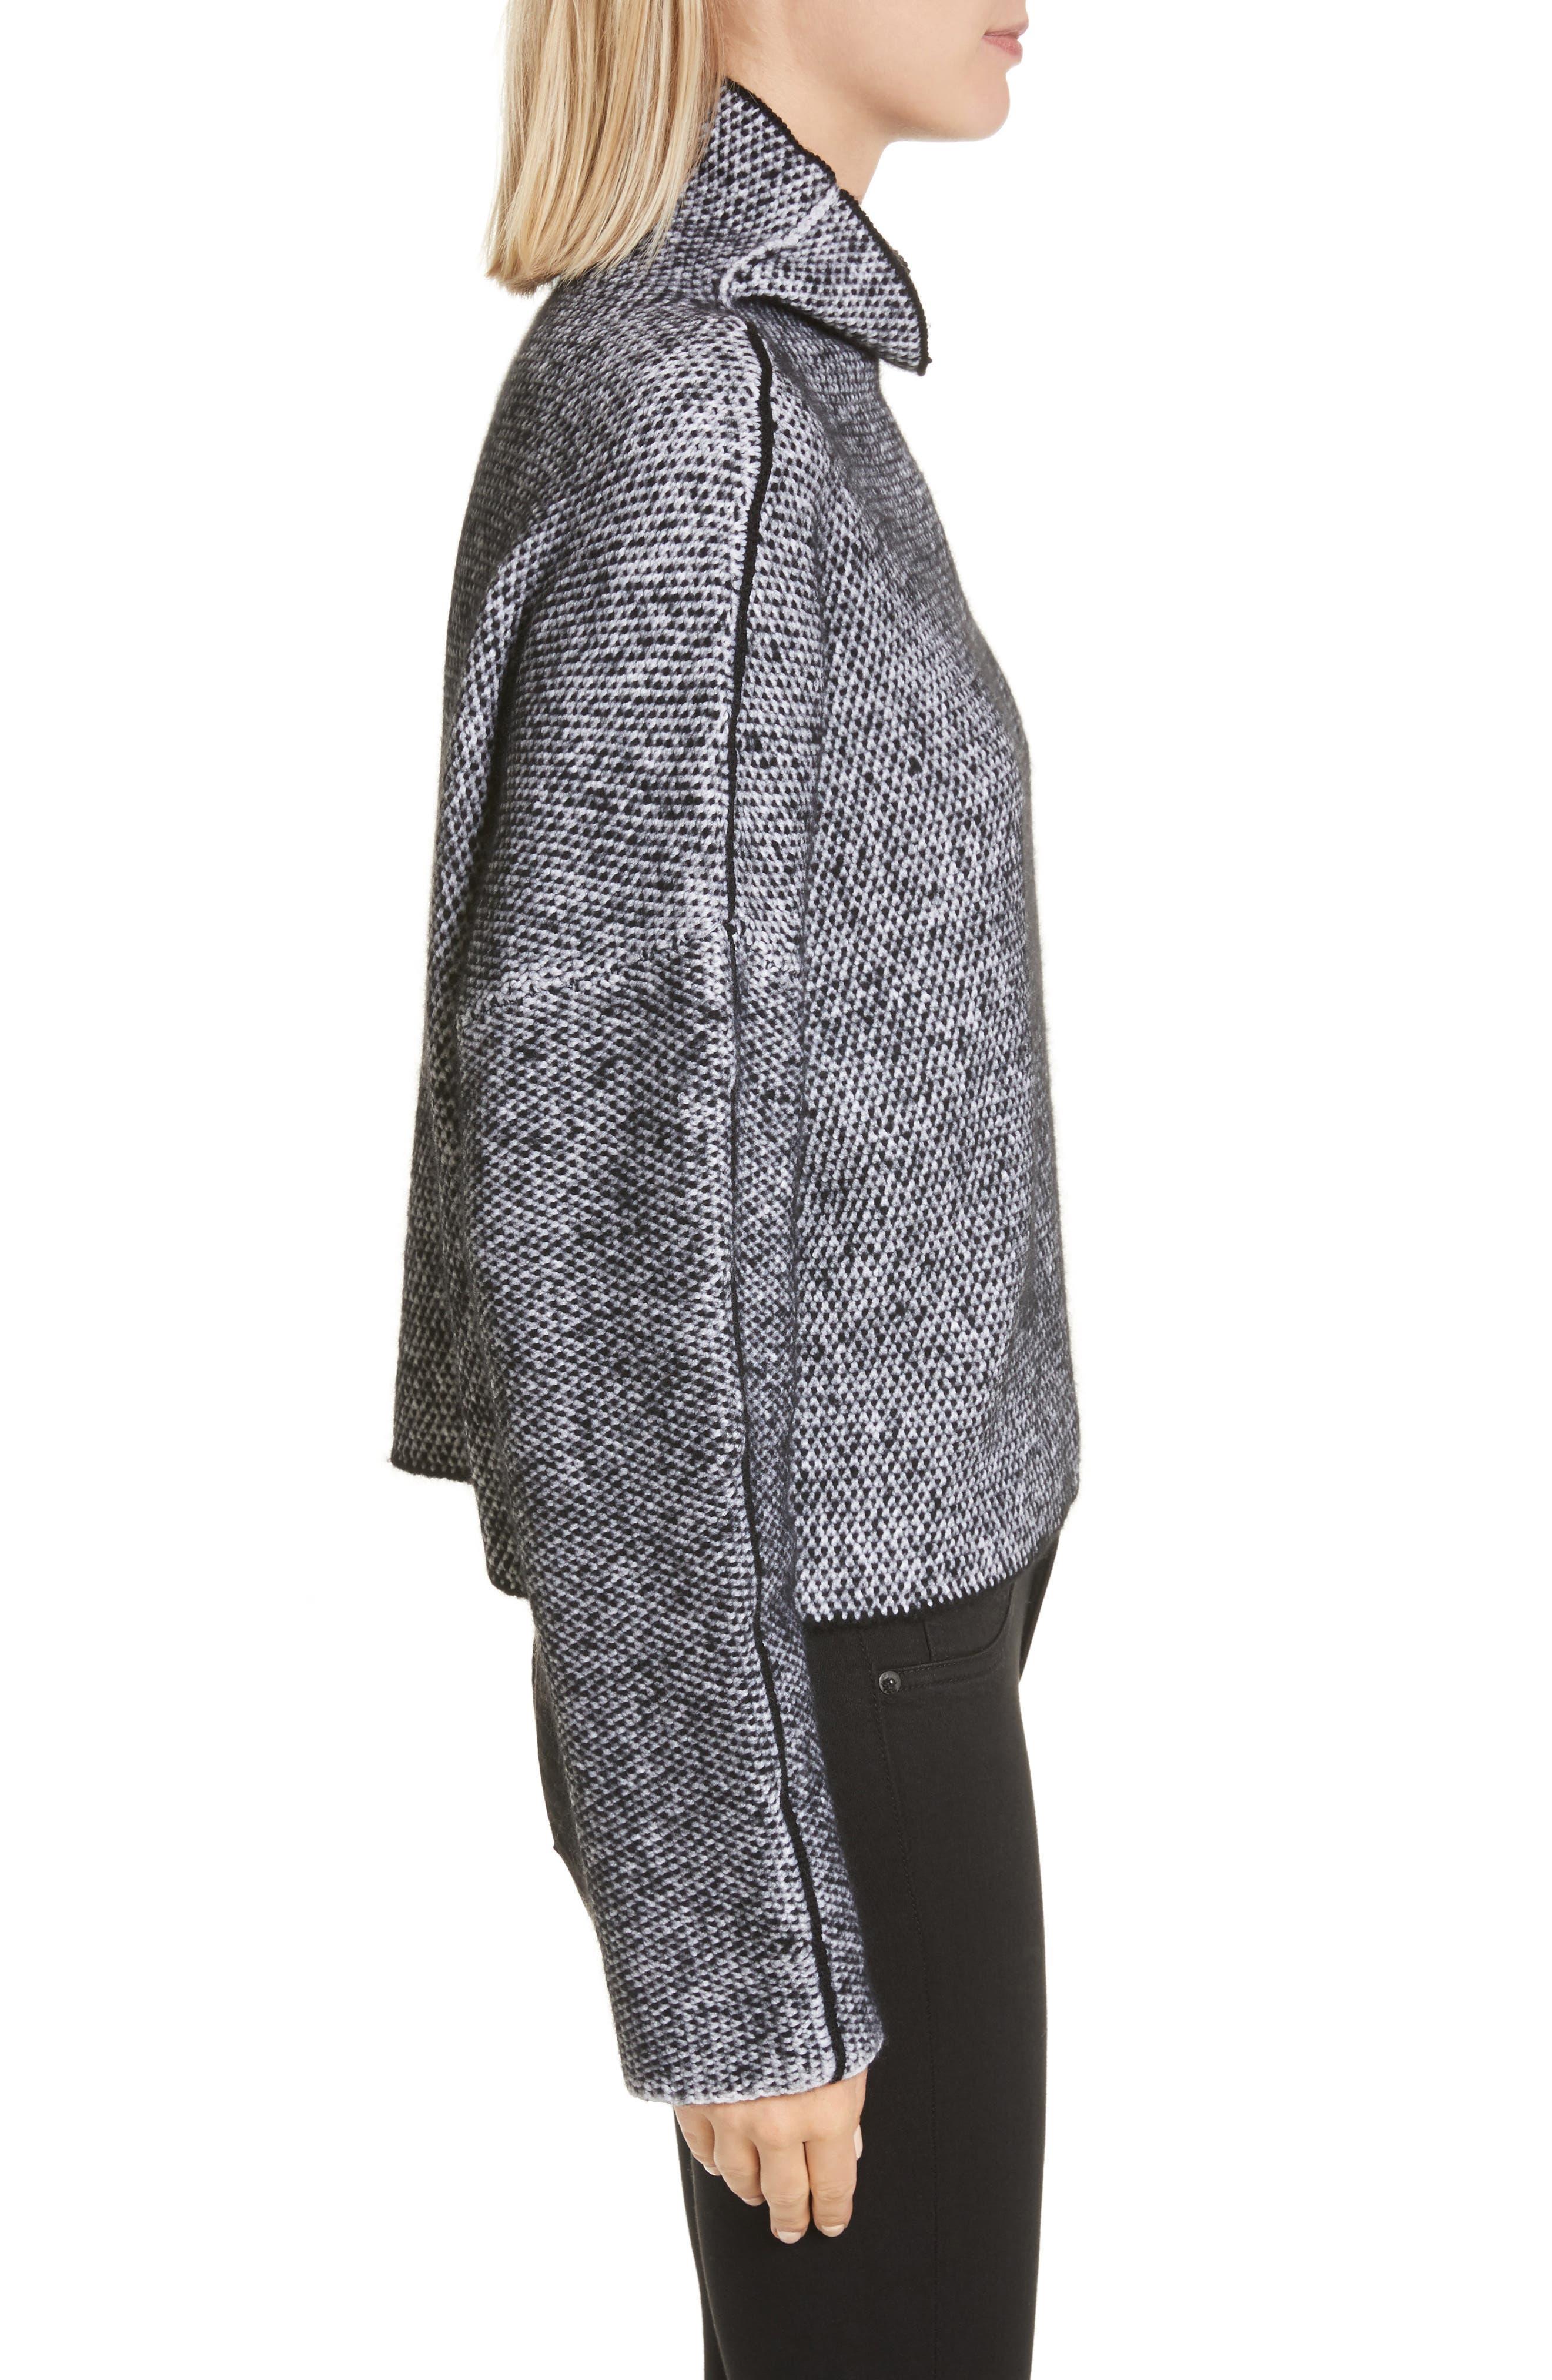 Robin Merino Wool Blend Sweater,                             Alternate thumbnail 3, color,                             001